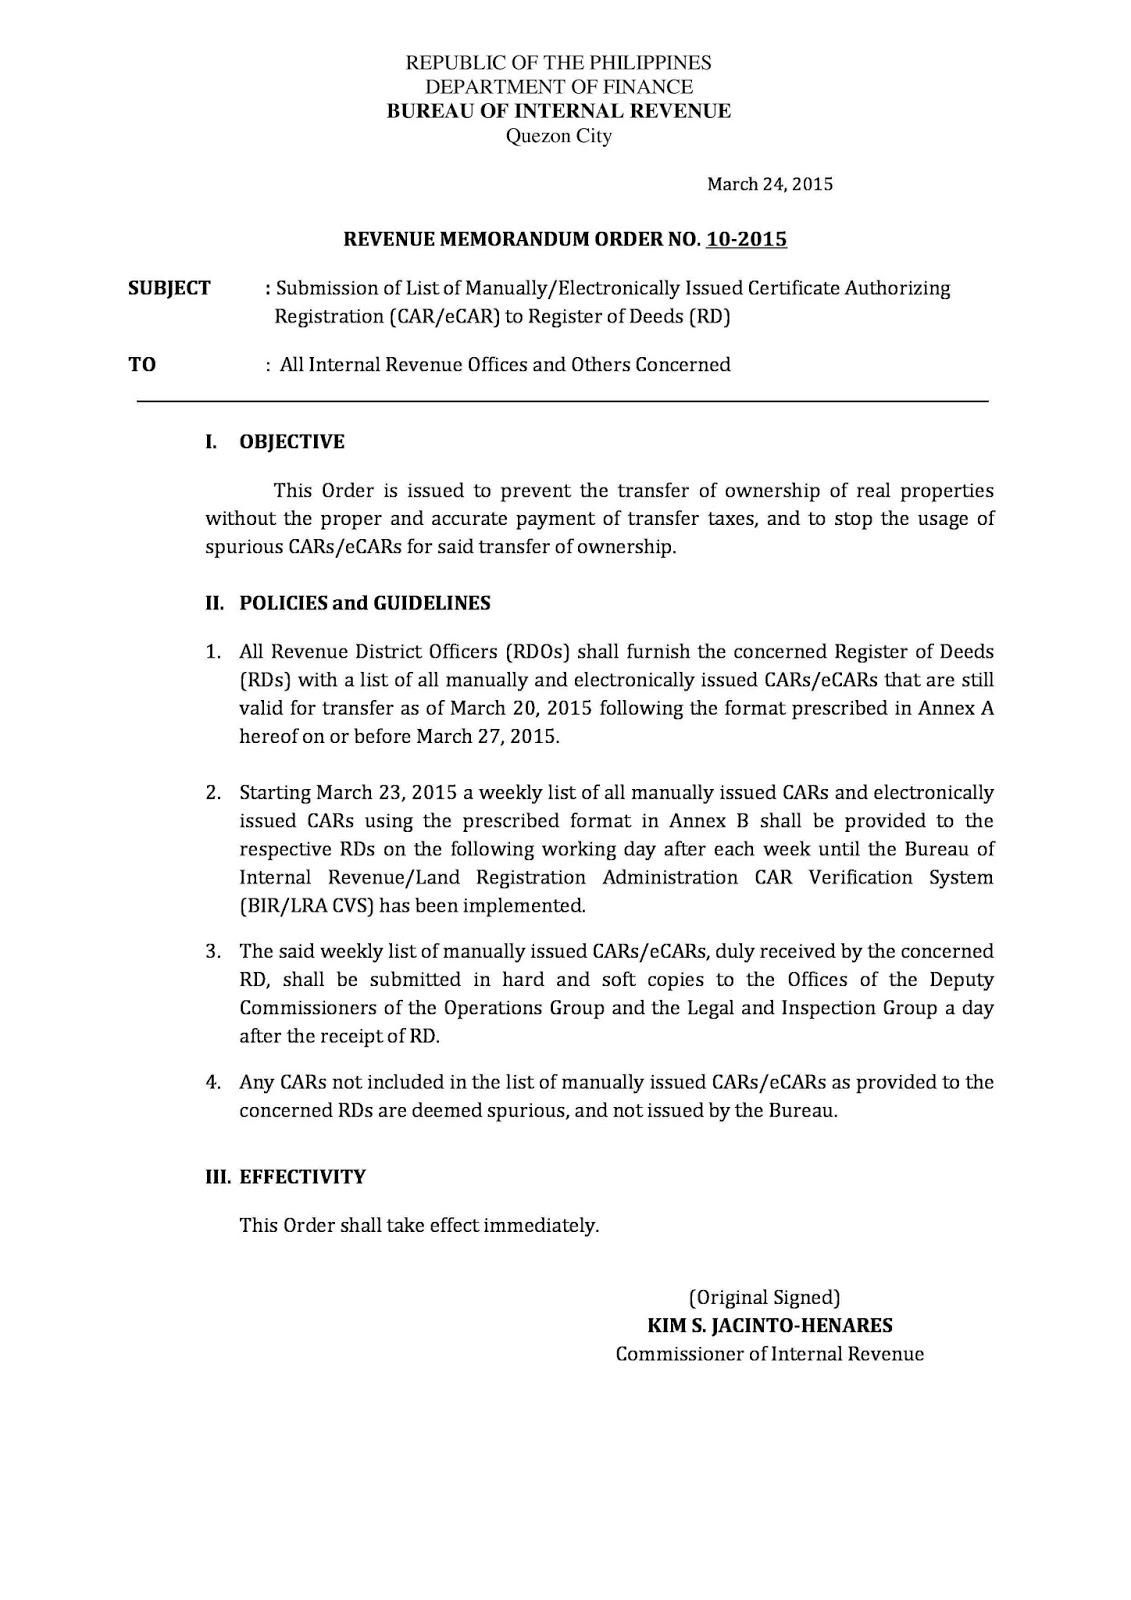 Registration Certificate For Car Registration Car/ecar to